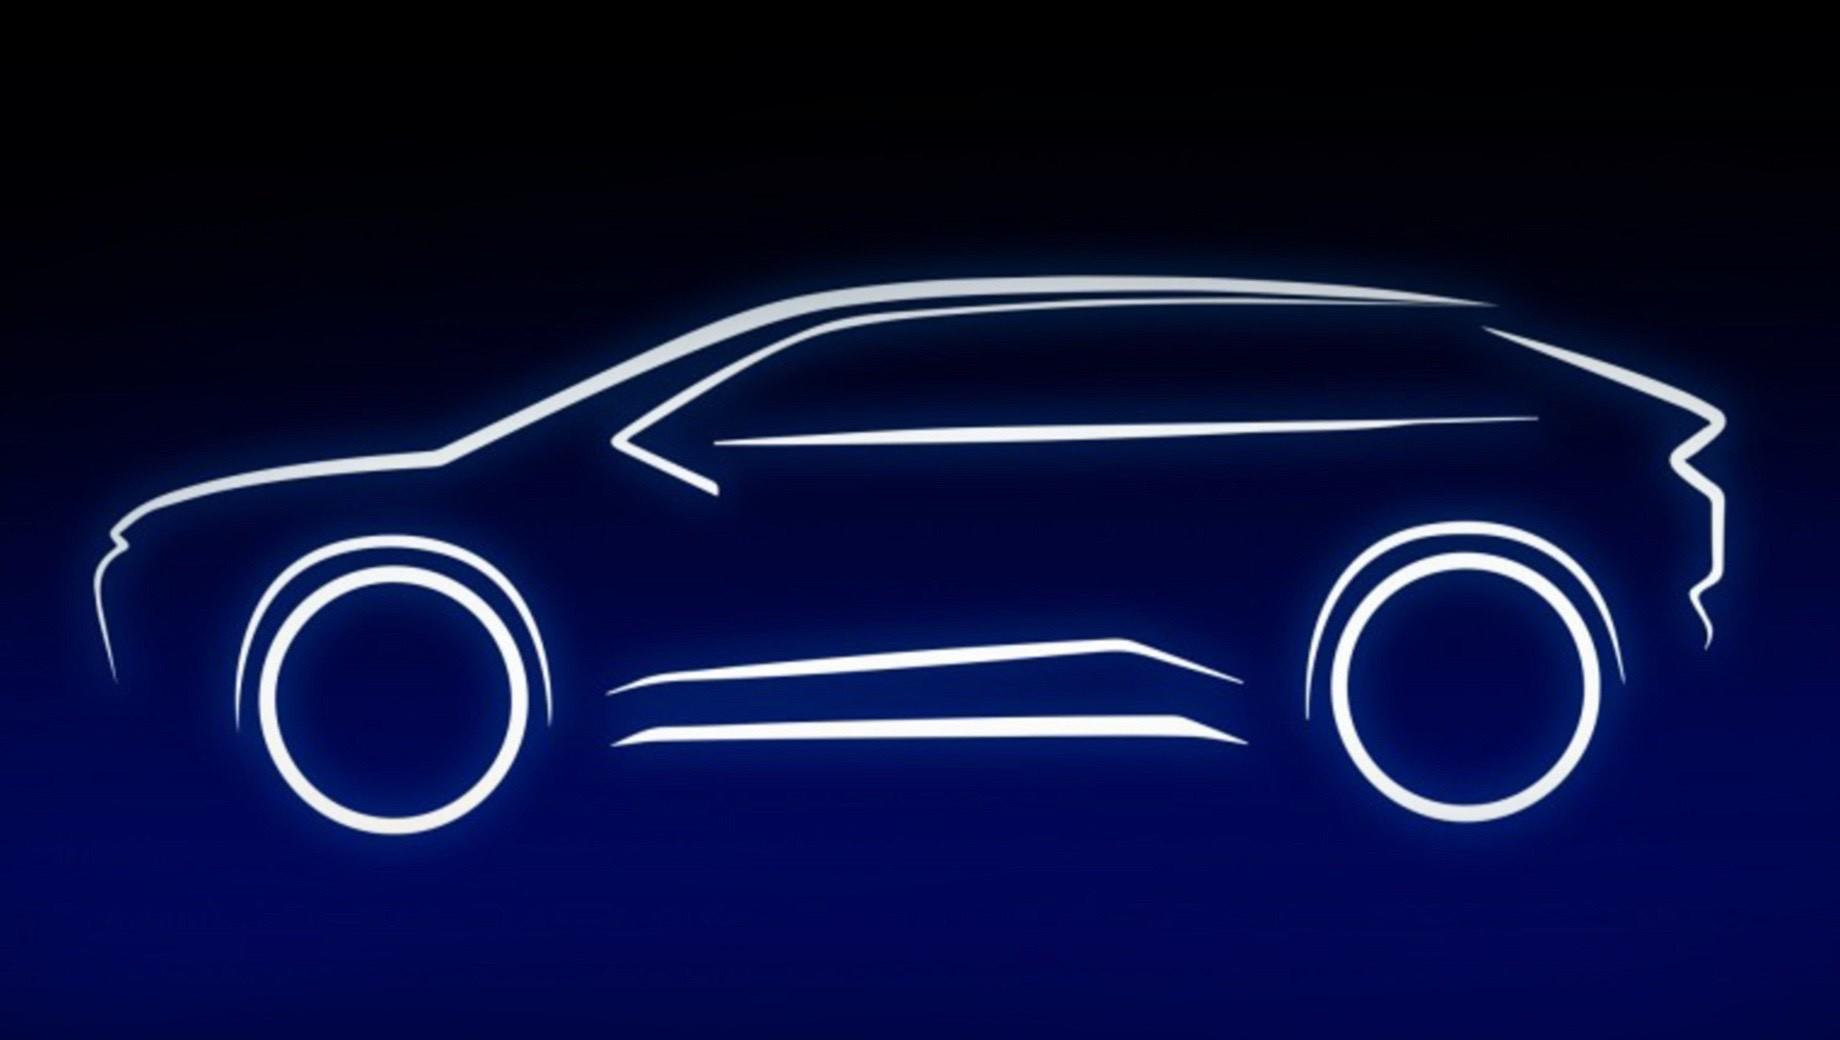 Toyota подготовила к выпуску кроссовер на платформе e-TNGA